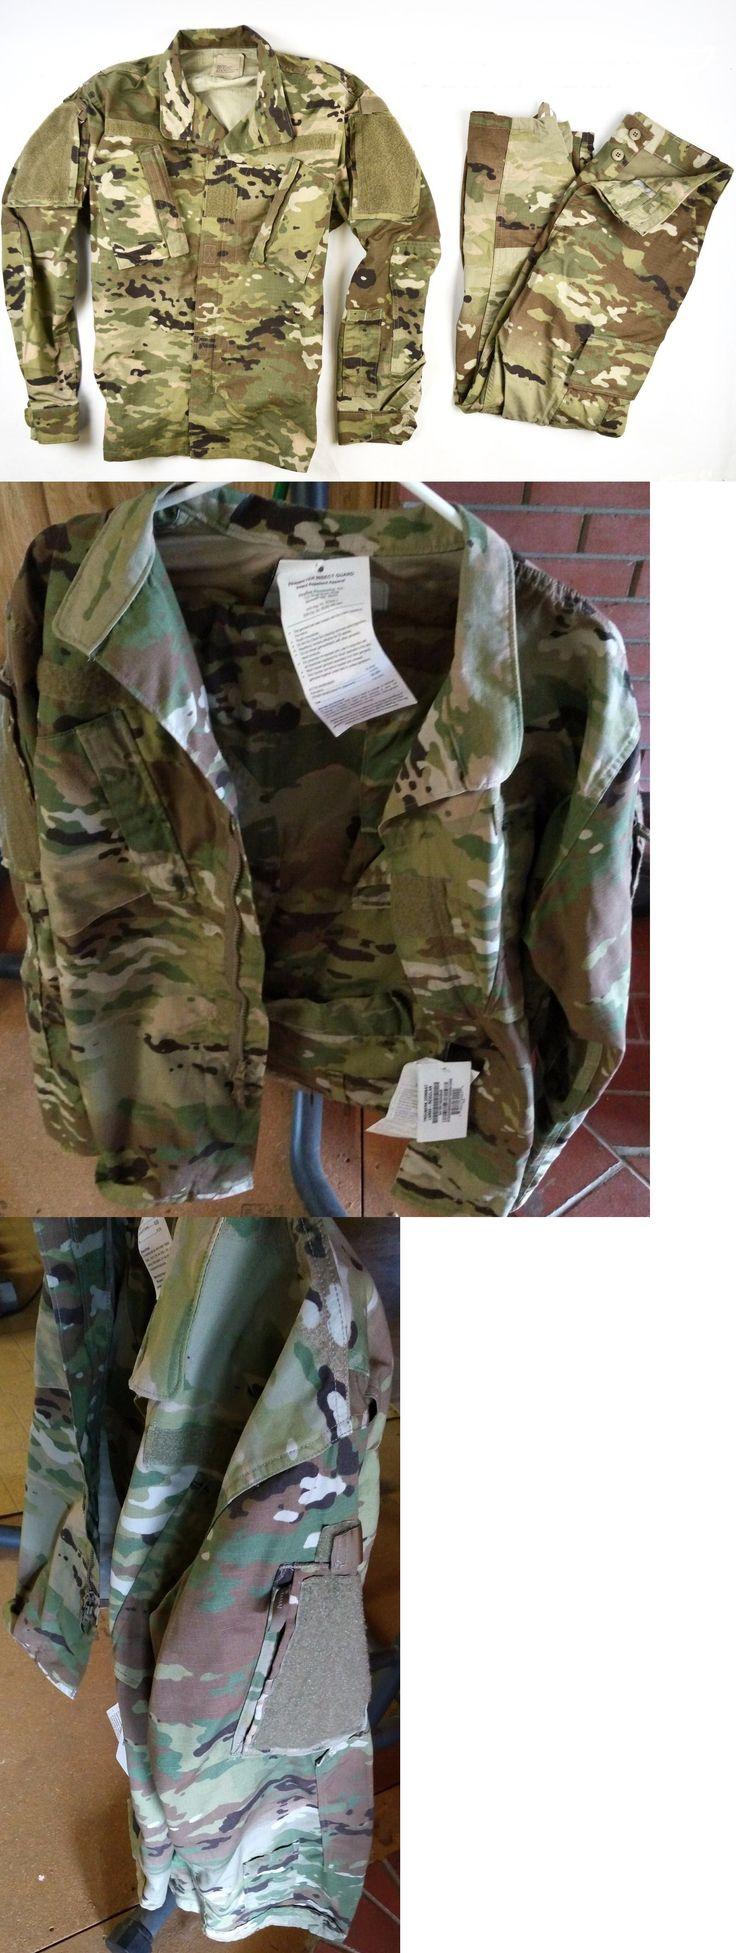 Tactical Clothing 177896: Army Usgi Military Uniform Scorpion W2 Ocp Camo Shirt Pant Lr Large Regular -> BUY IT NOW ONLY: $67.44 on eBay!